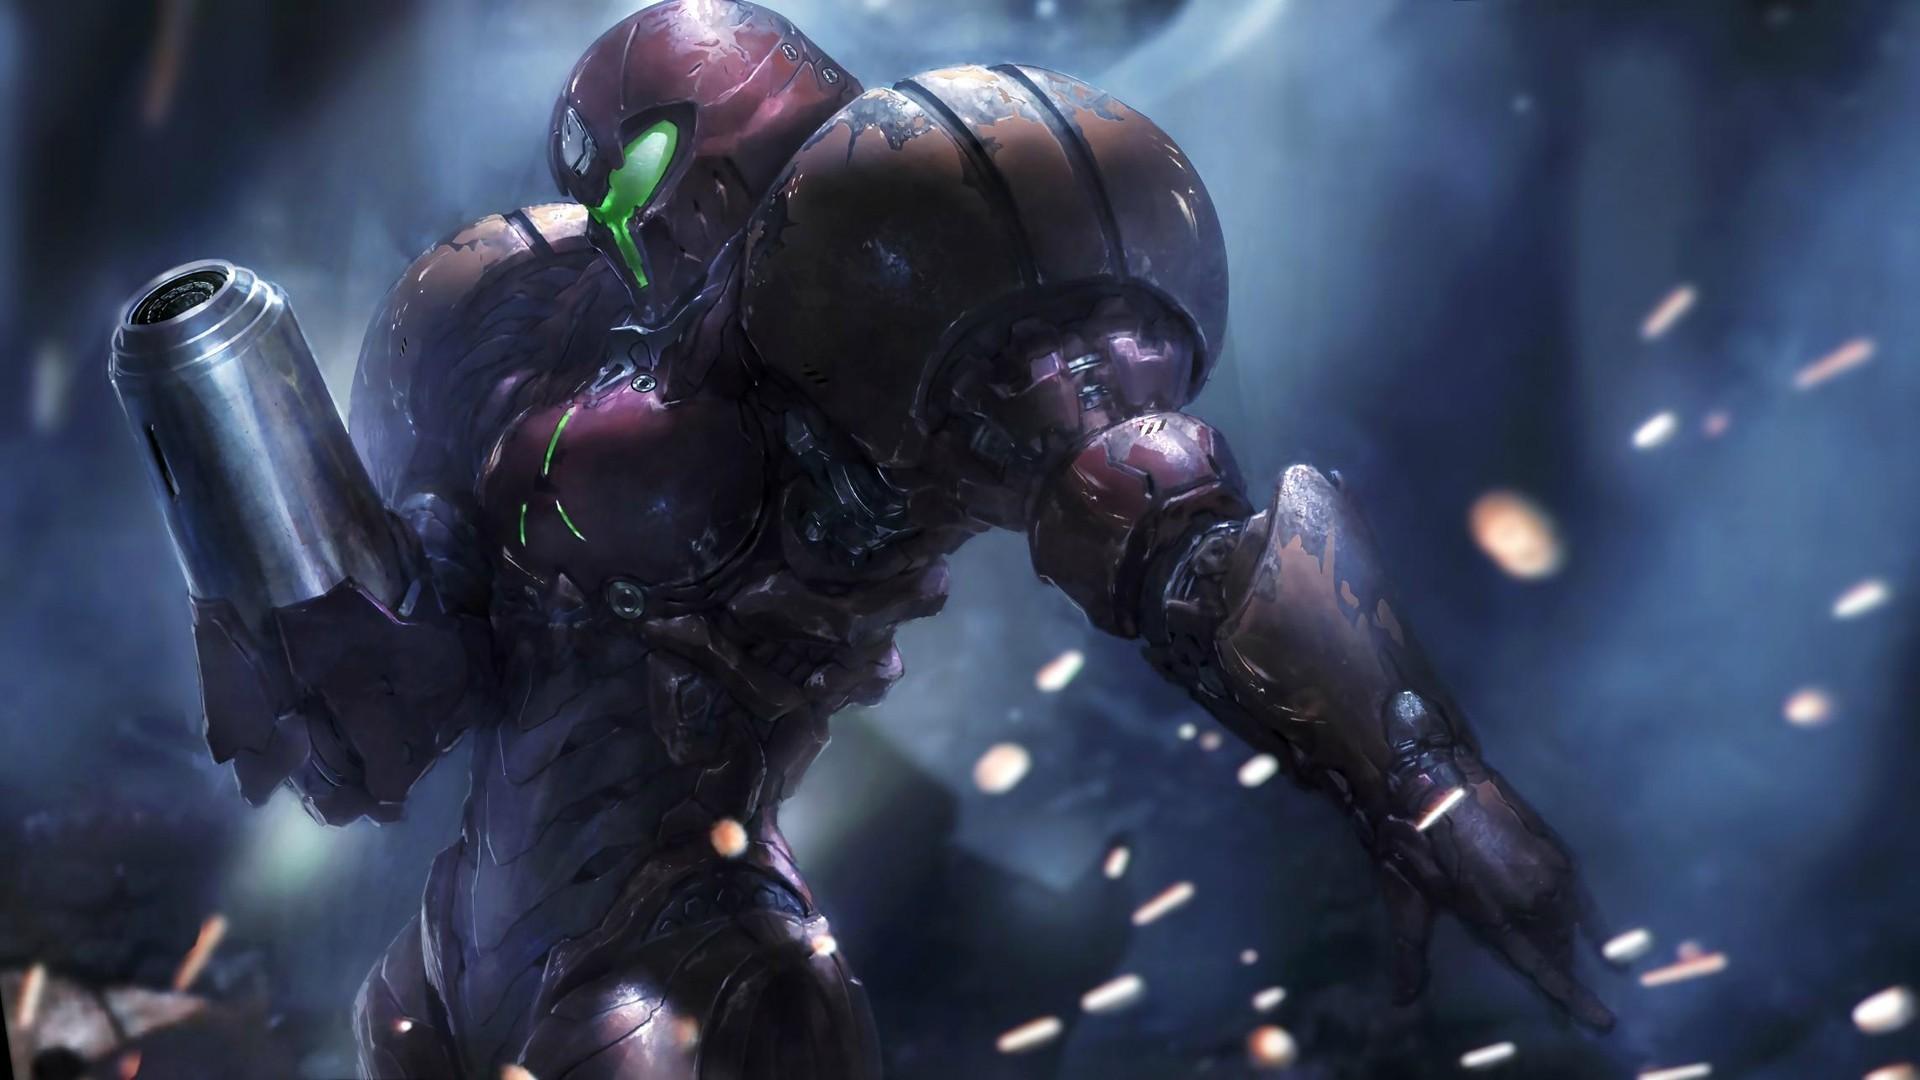 General video games Metroid Samus Aran